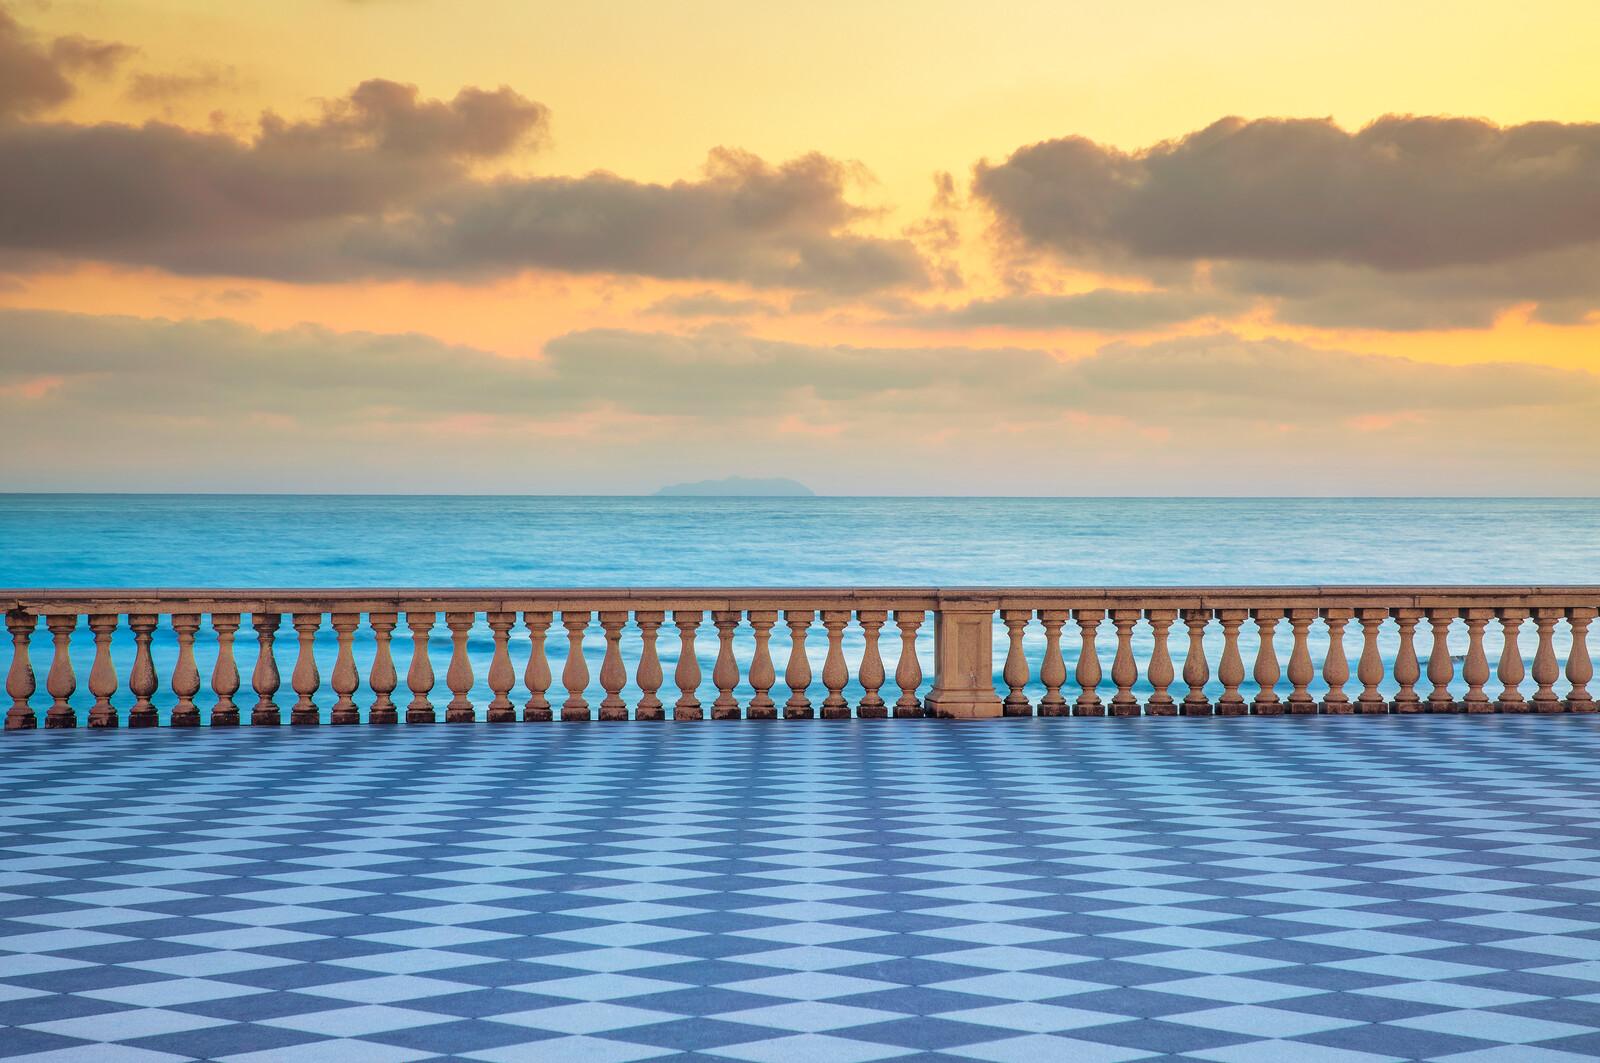 Sul mare I - Sven Fennema